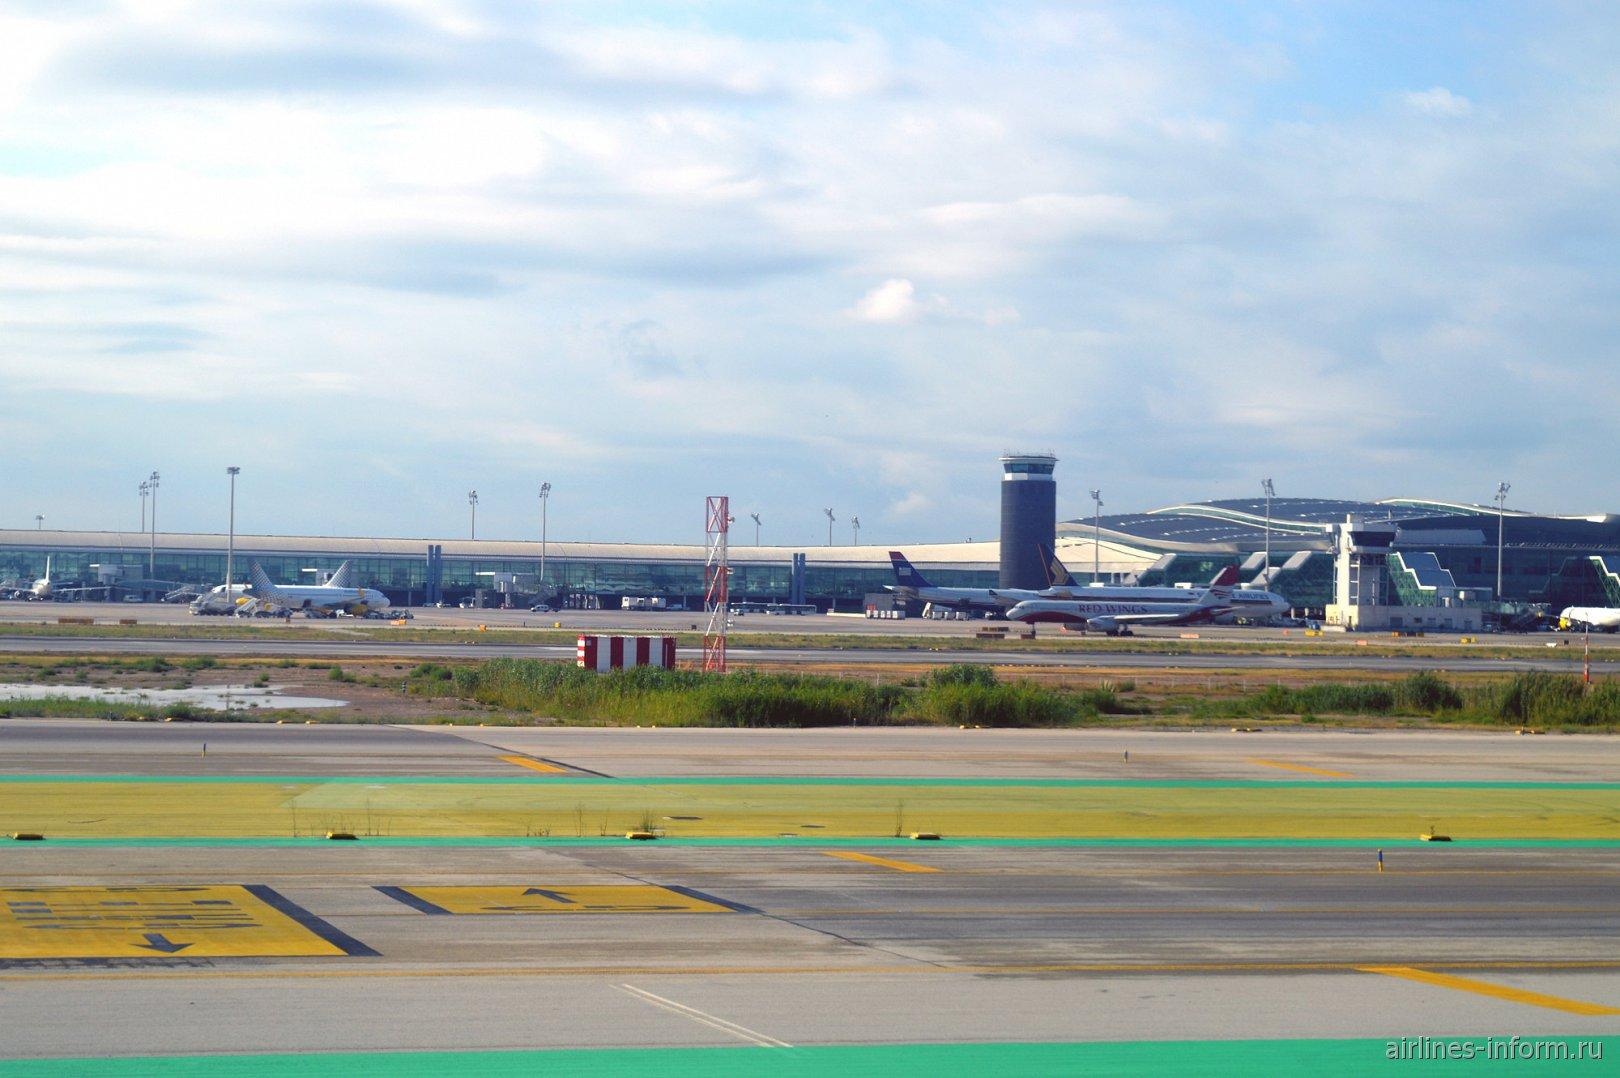 В аэропорту Эль-Прат в Барселоне